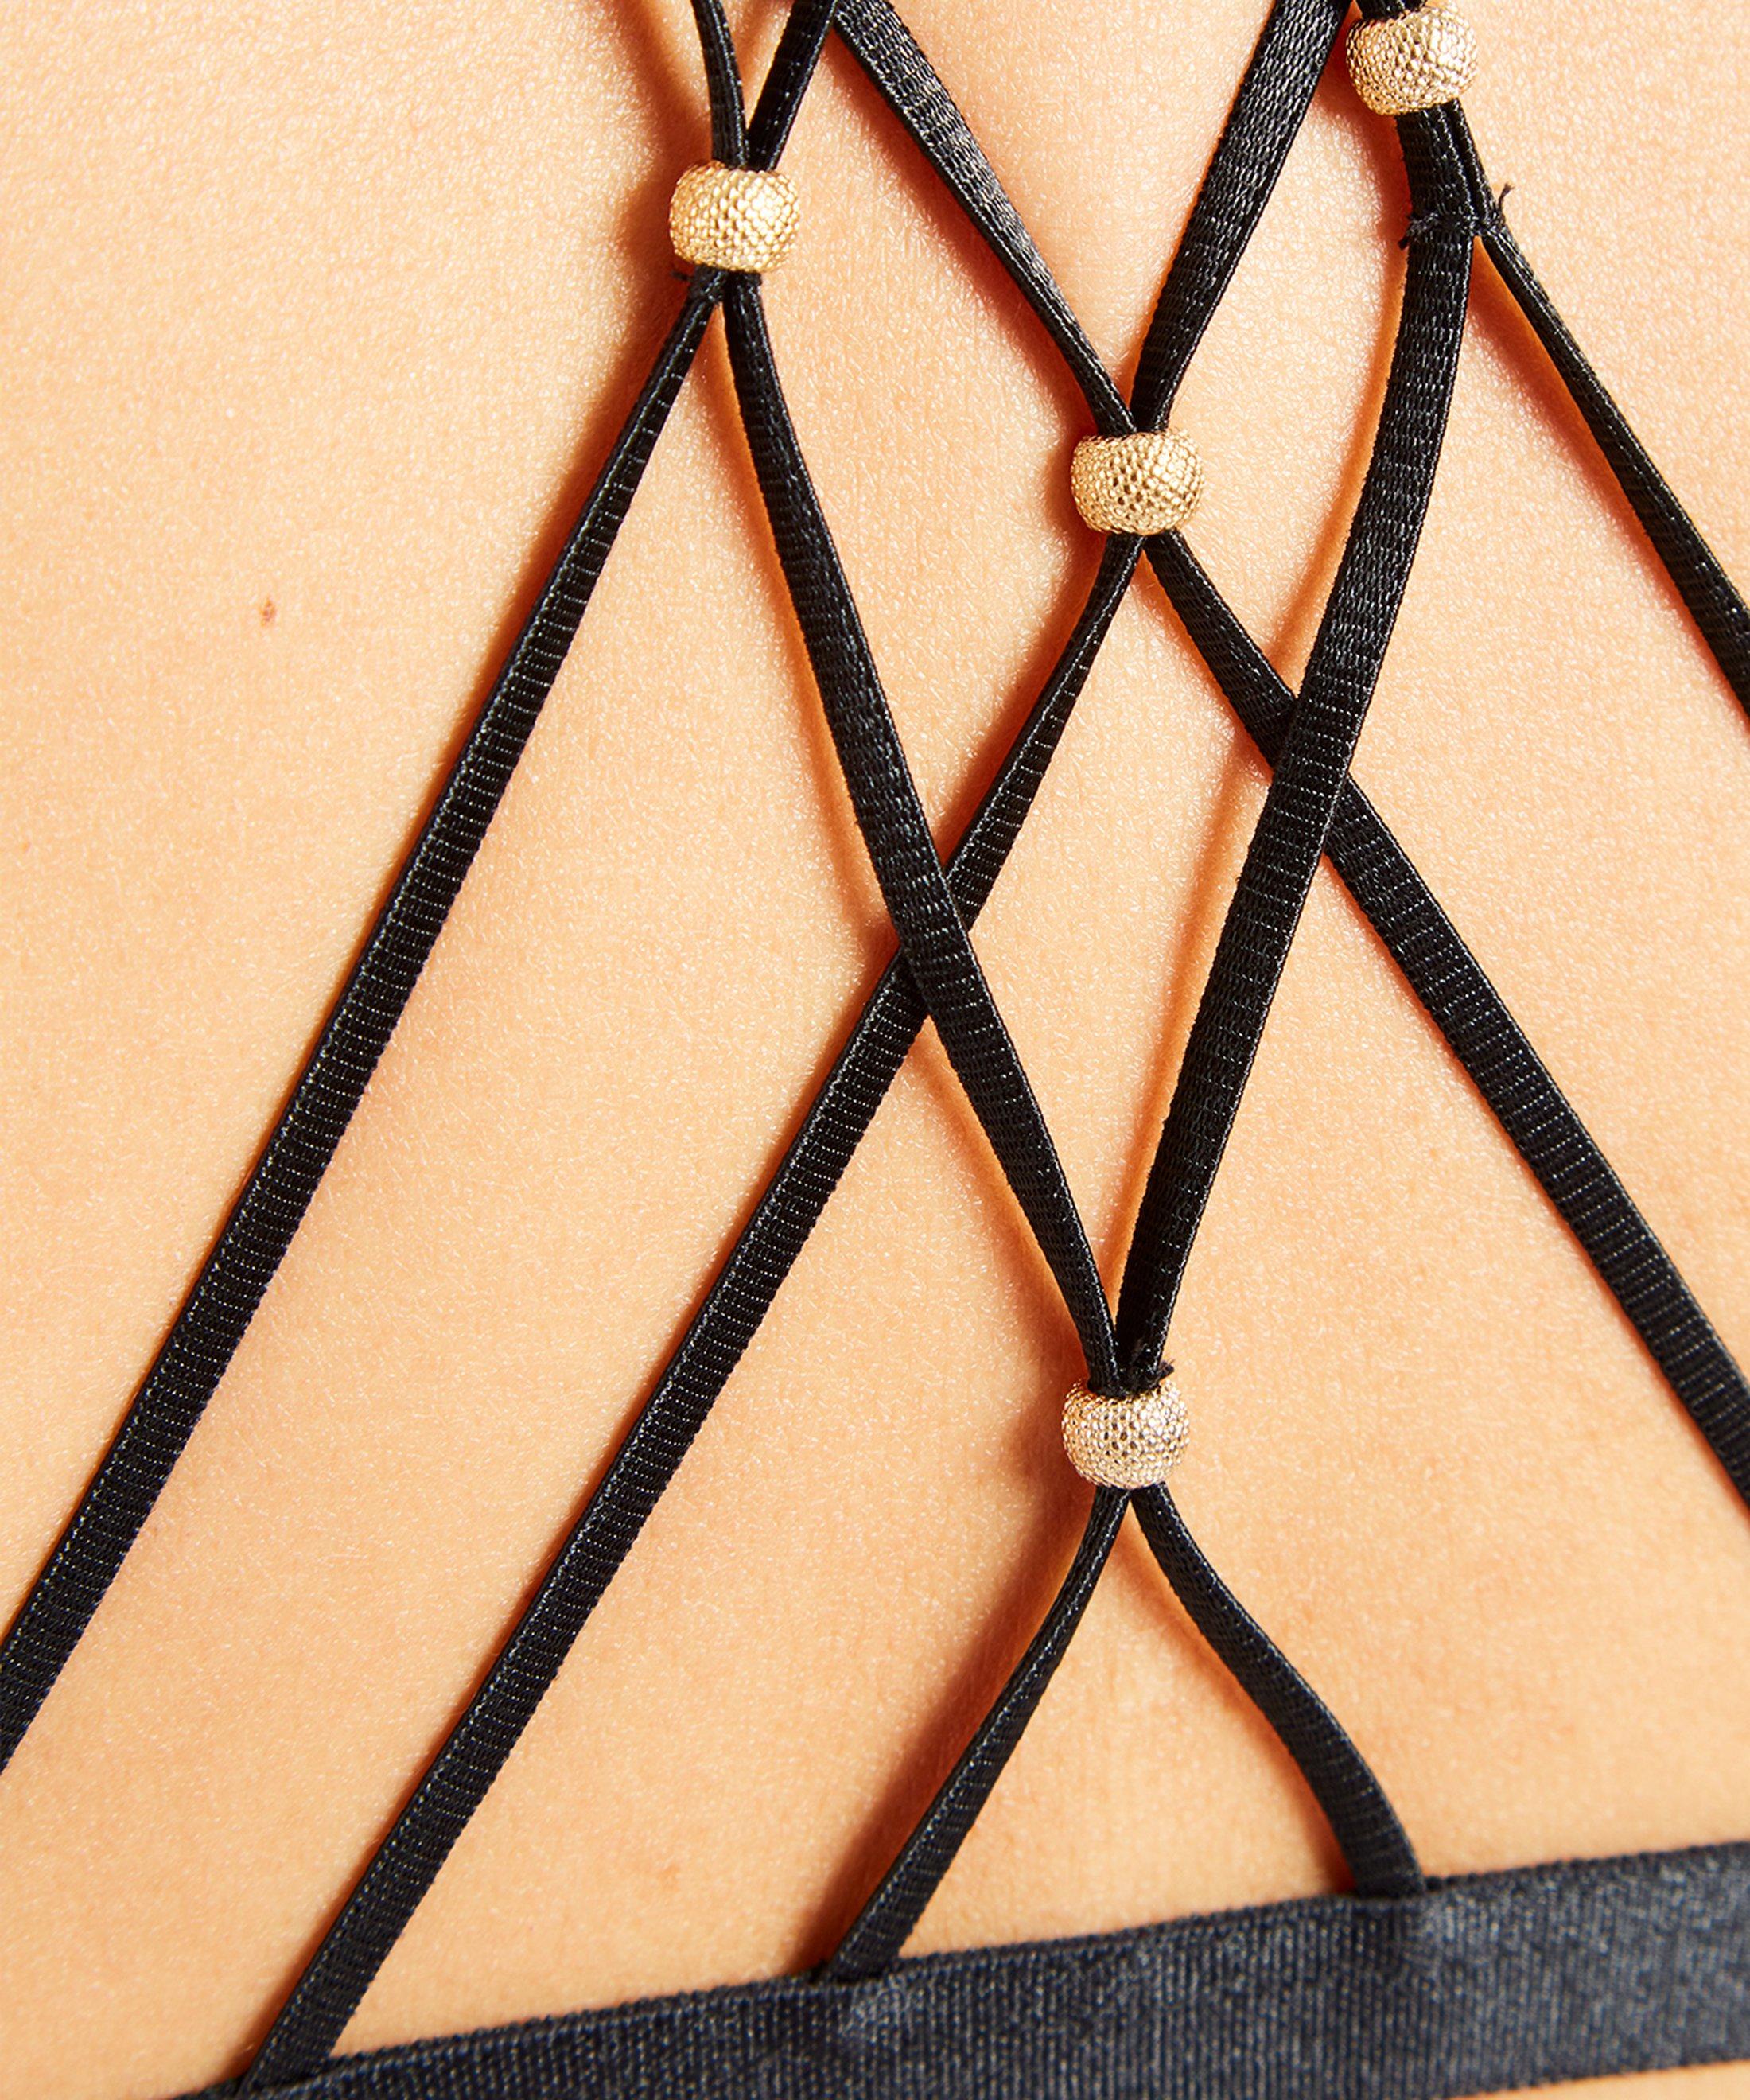 LA BELLE ÉTOILE Wireless triangle bra Onyx | Aubade